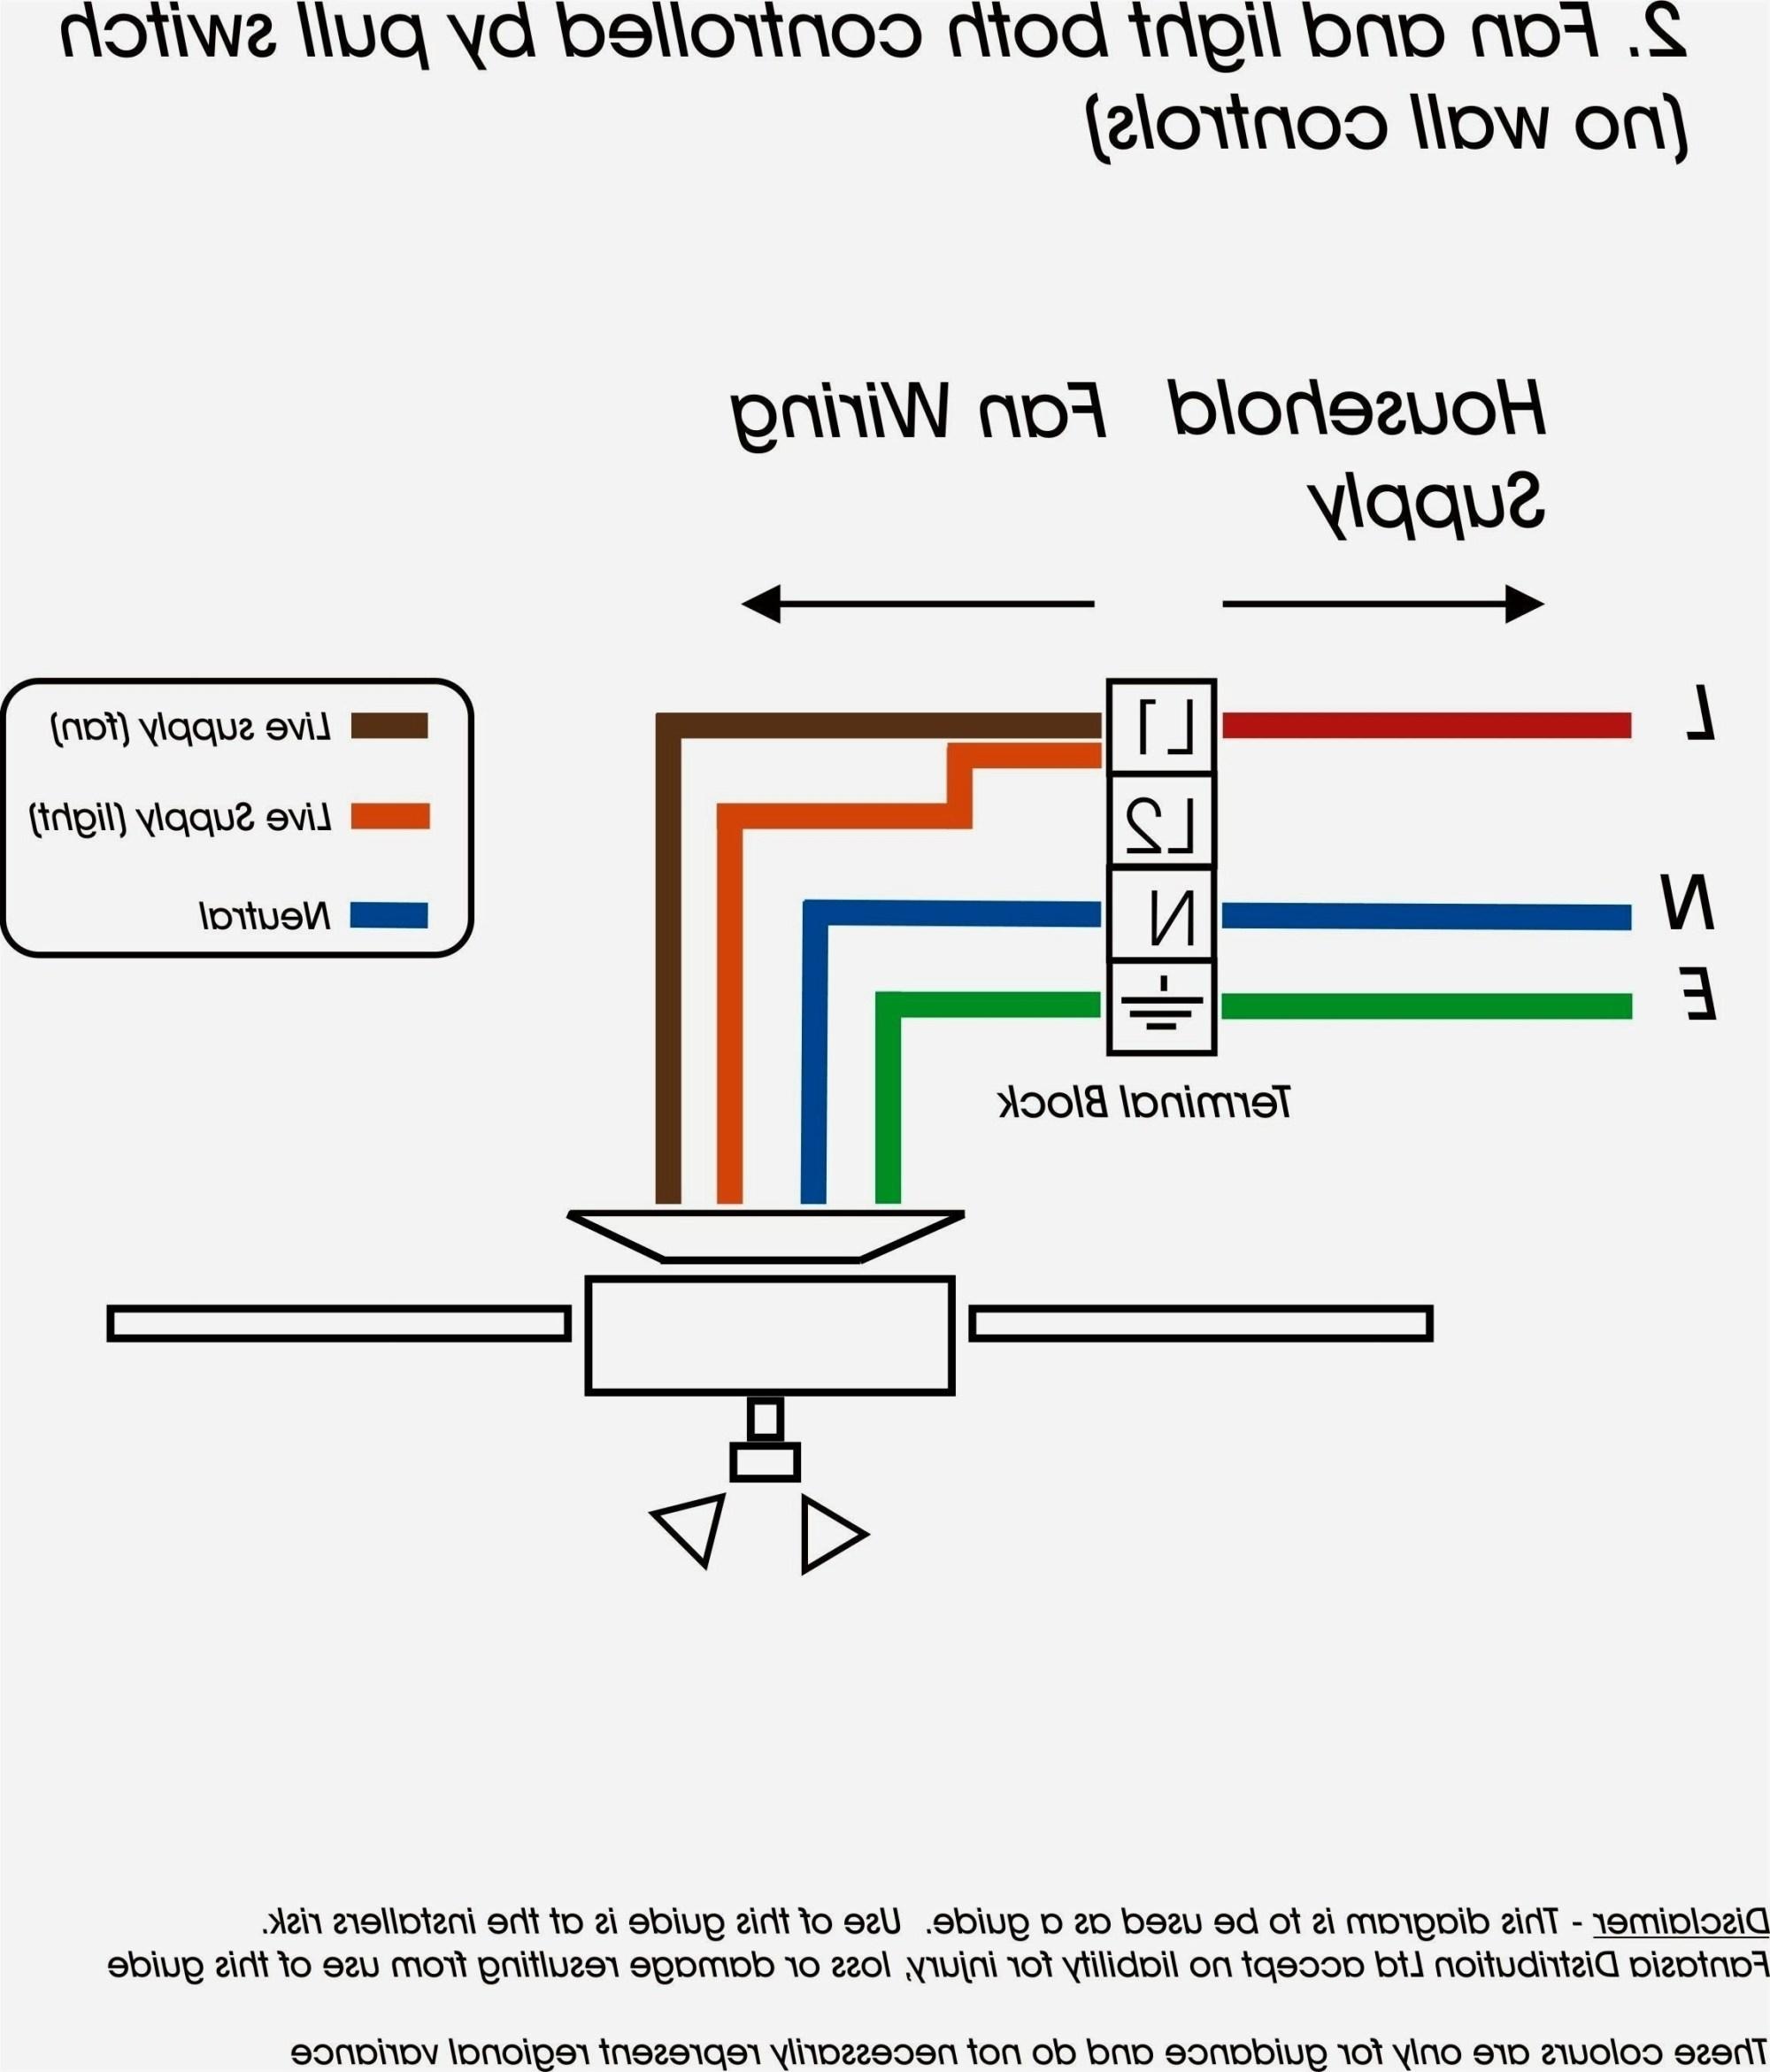 hight resolution of lithonia lighting wiring diagram